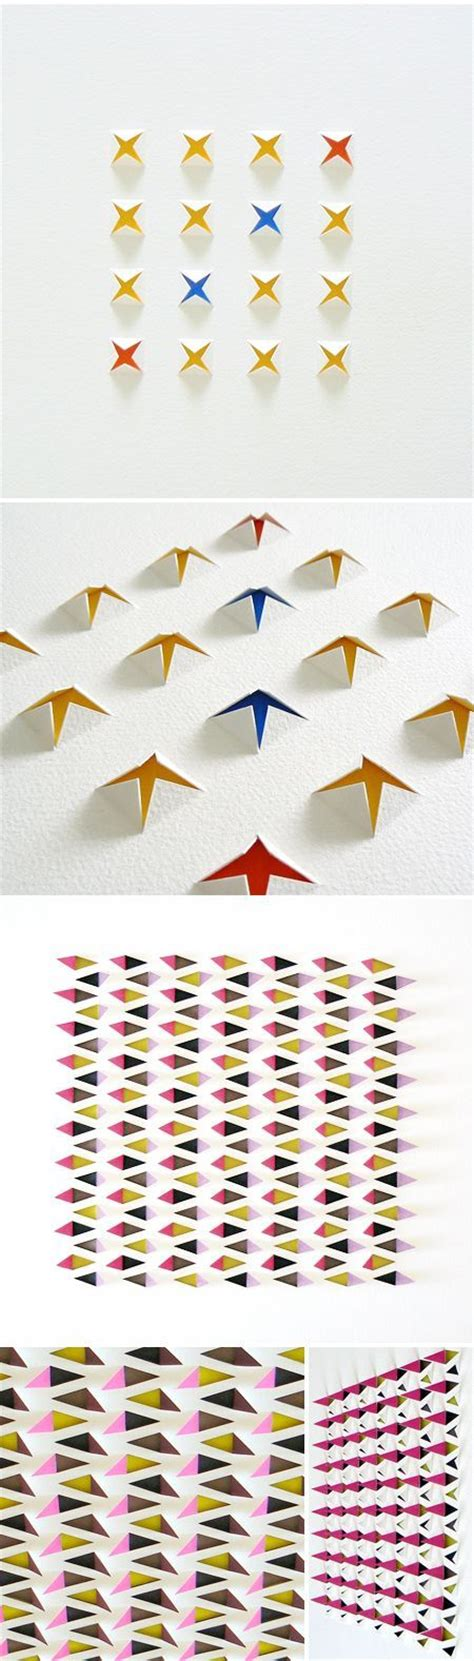 pattern making paper australia best 20 cut paper ideas on pinterest cut paper art